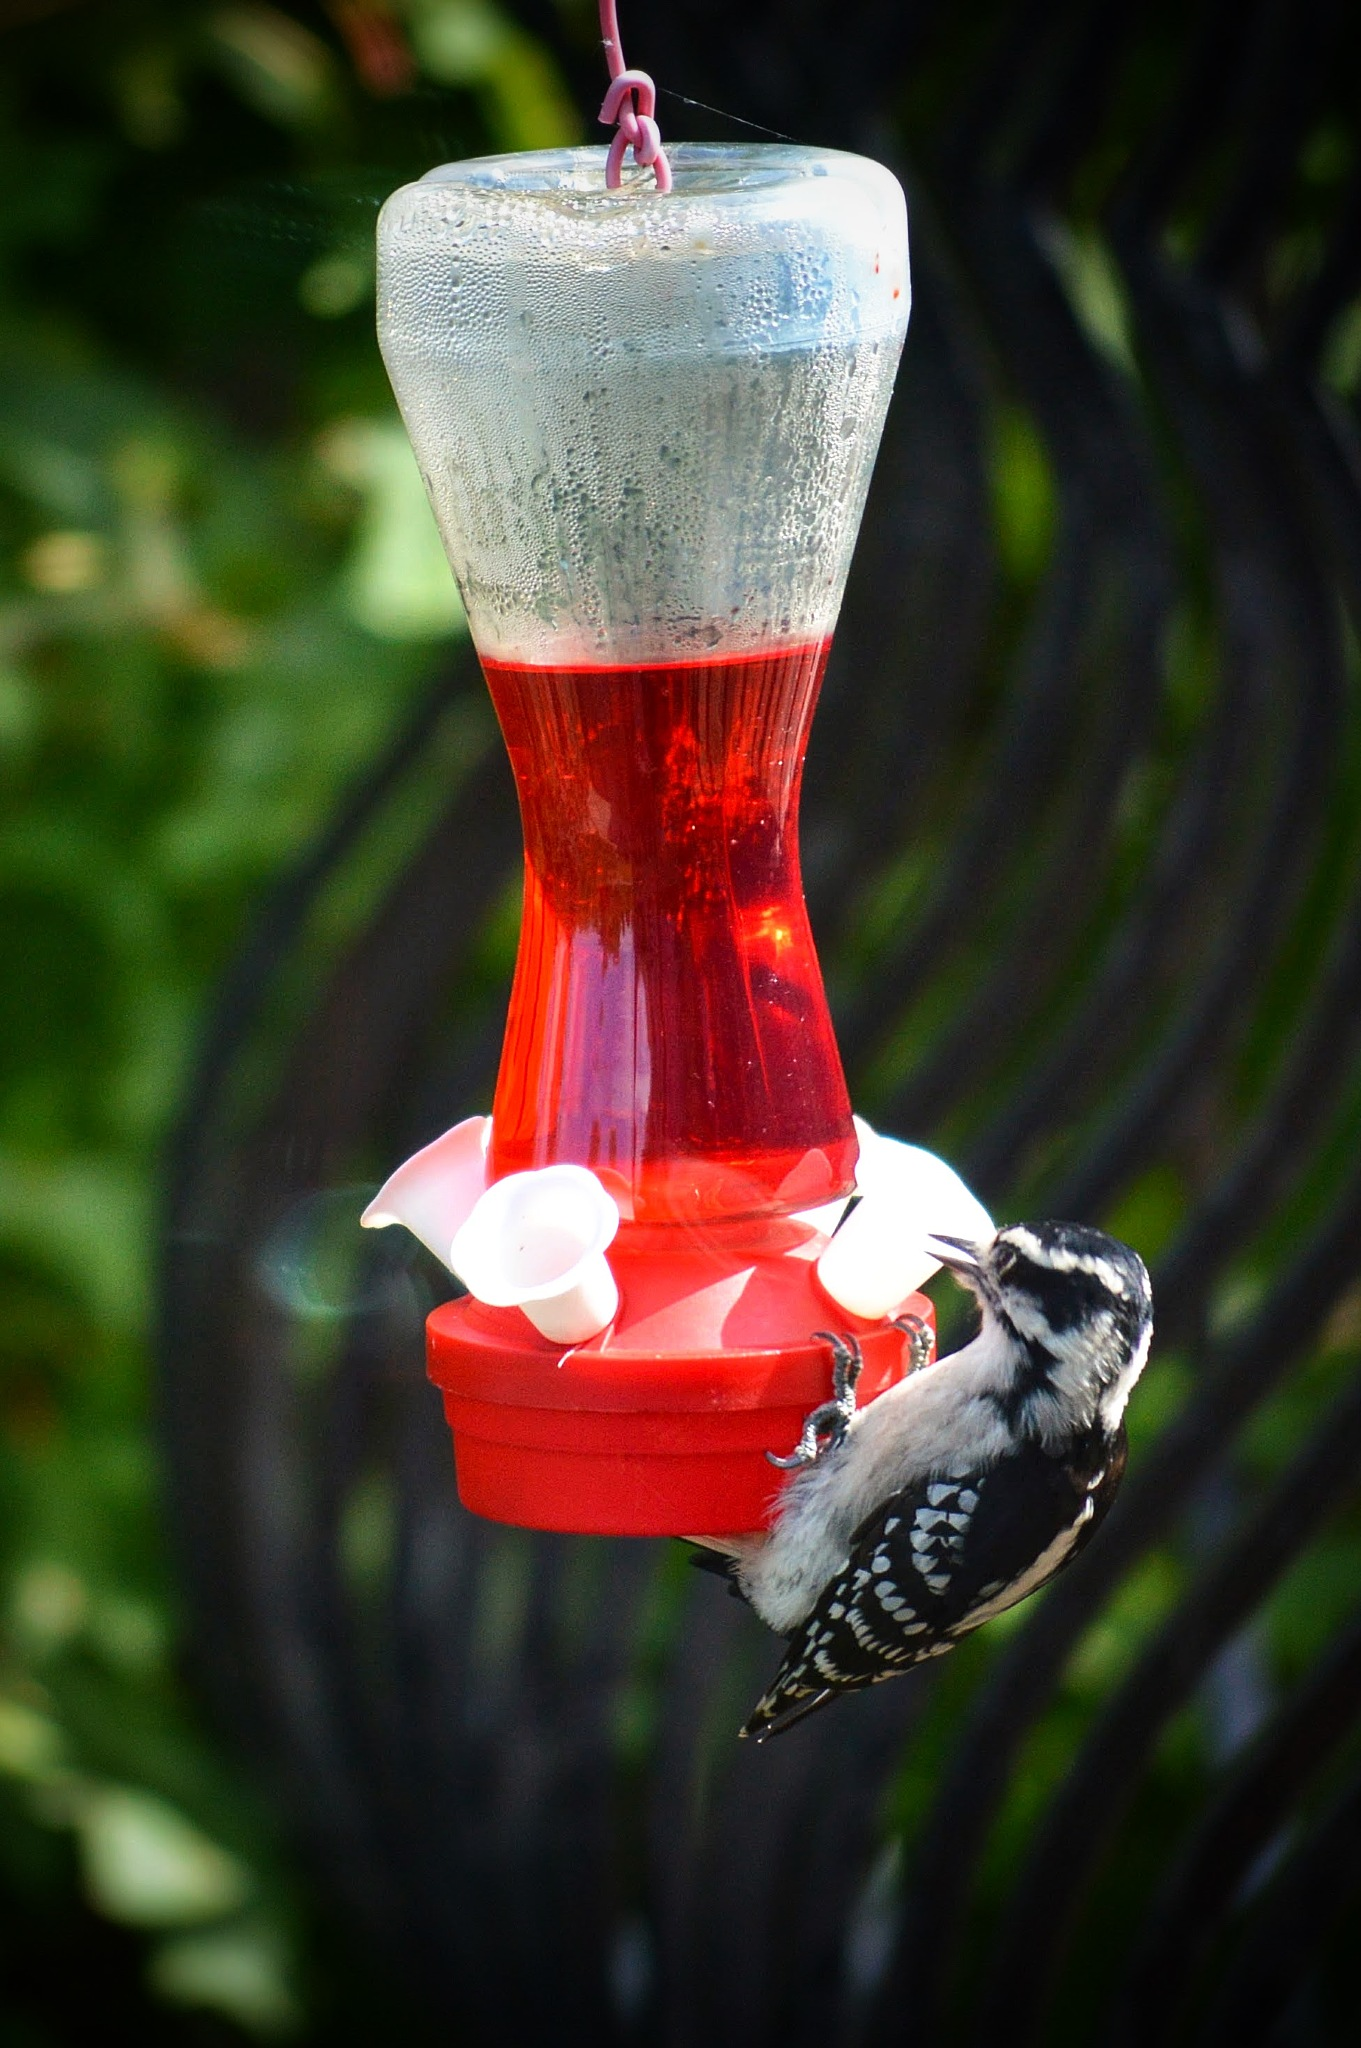 Carpenter bird as a Hummingbird by drcarlosesparza